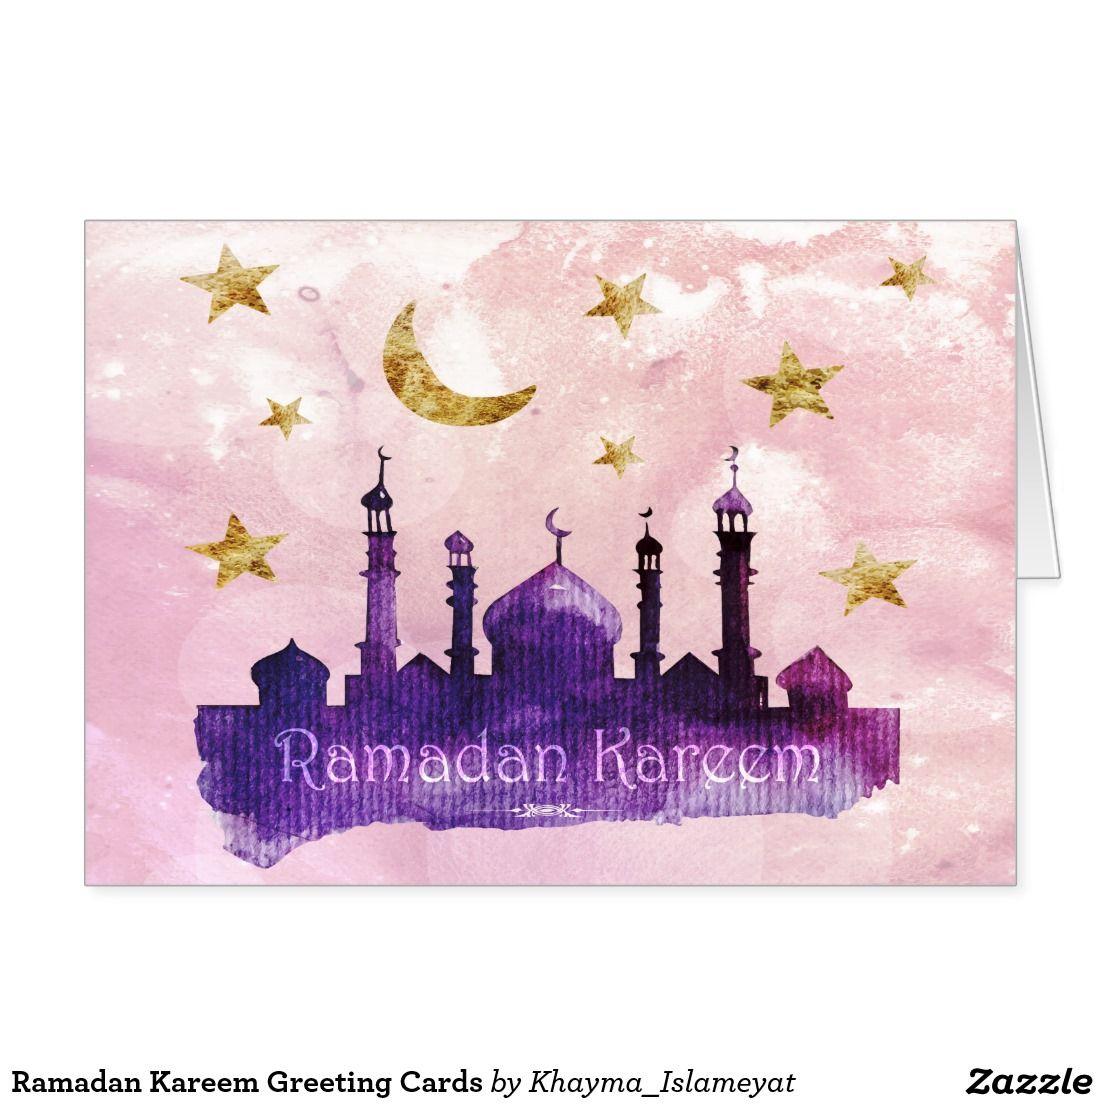 Ramadan Kareem Greeting Cards Greeting Cards Pinterest Ramadan